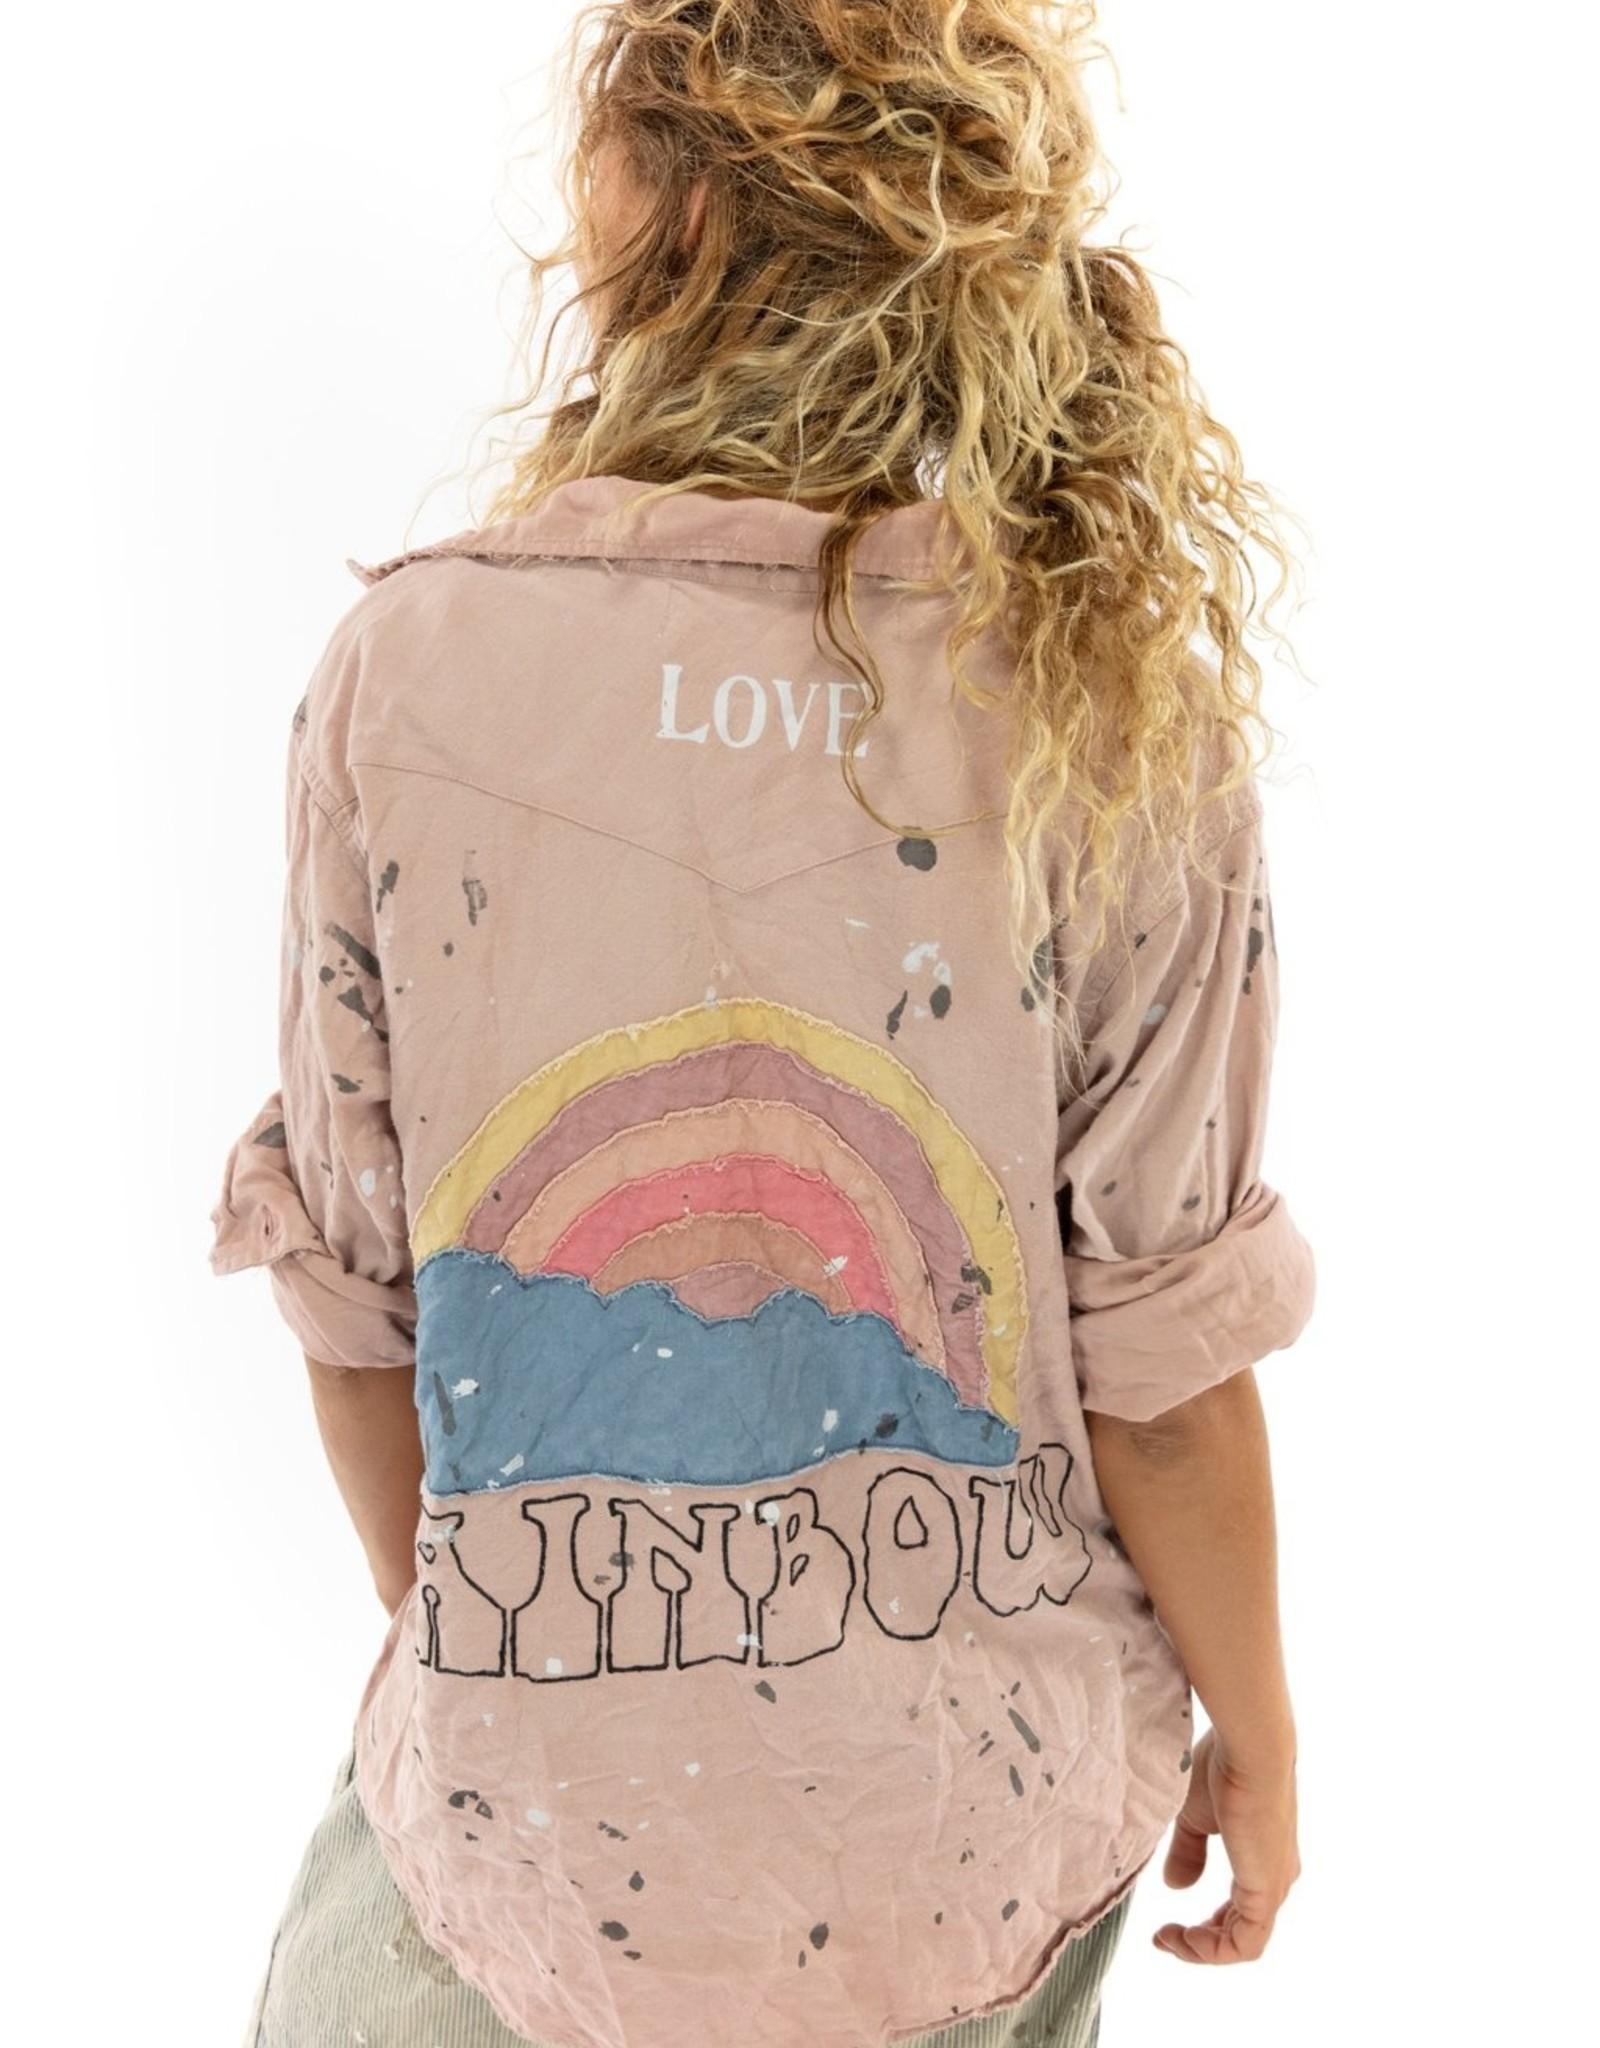 MAGNOLIA PEARL Applique Kelly Shirt